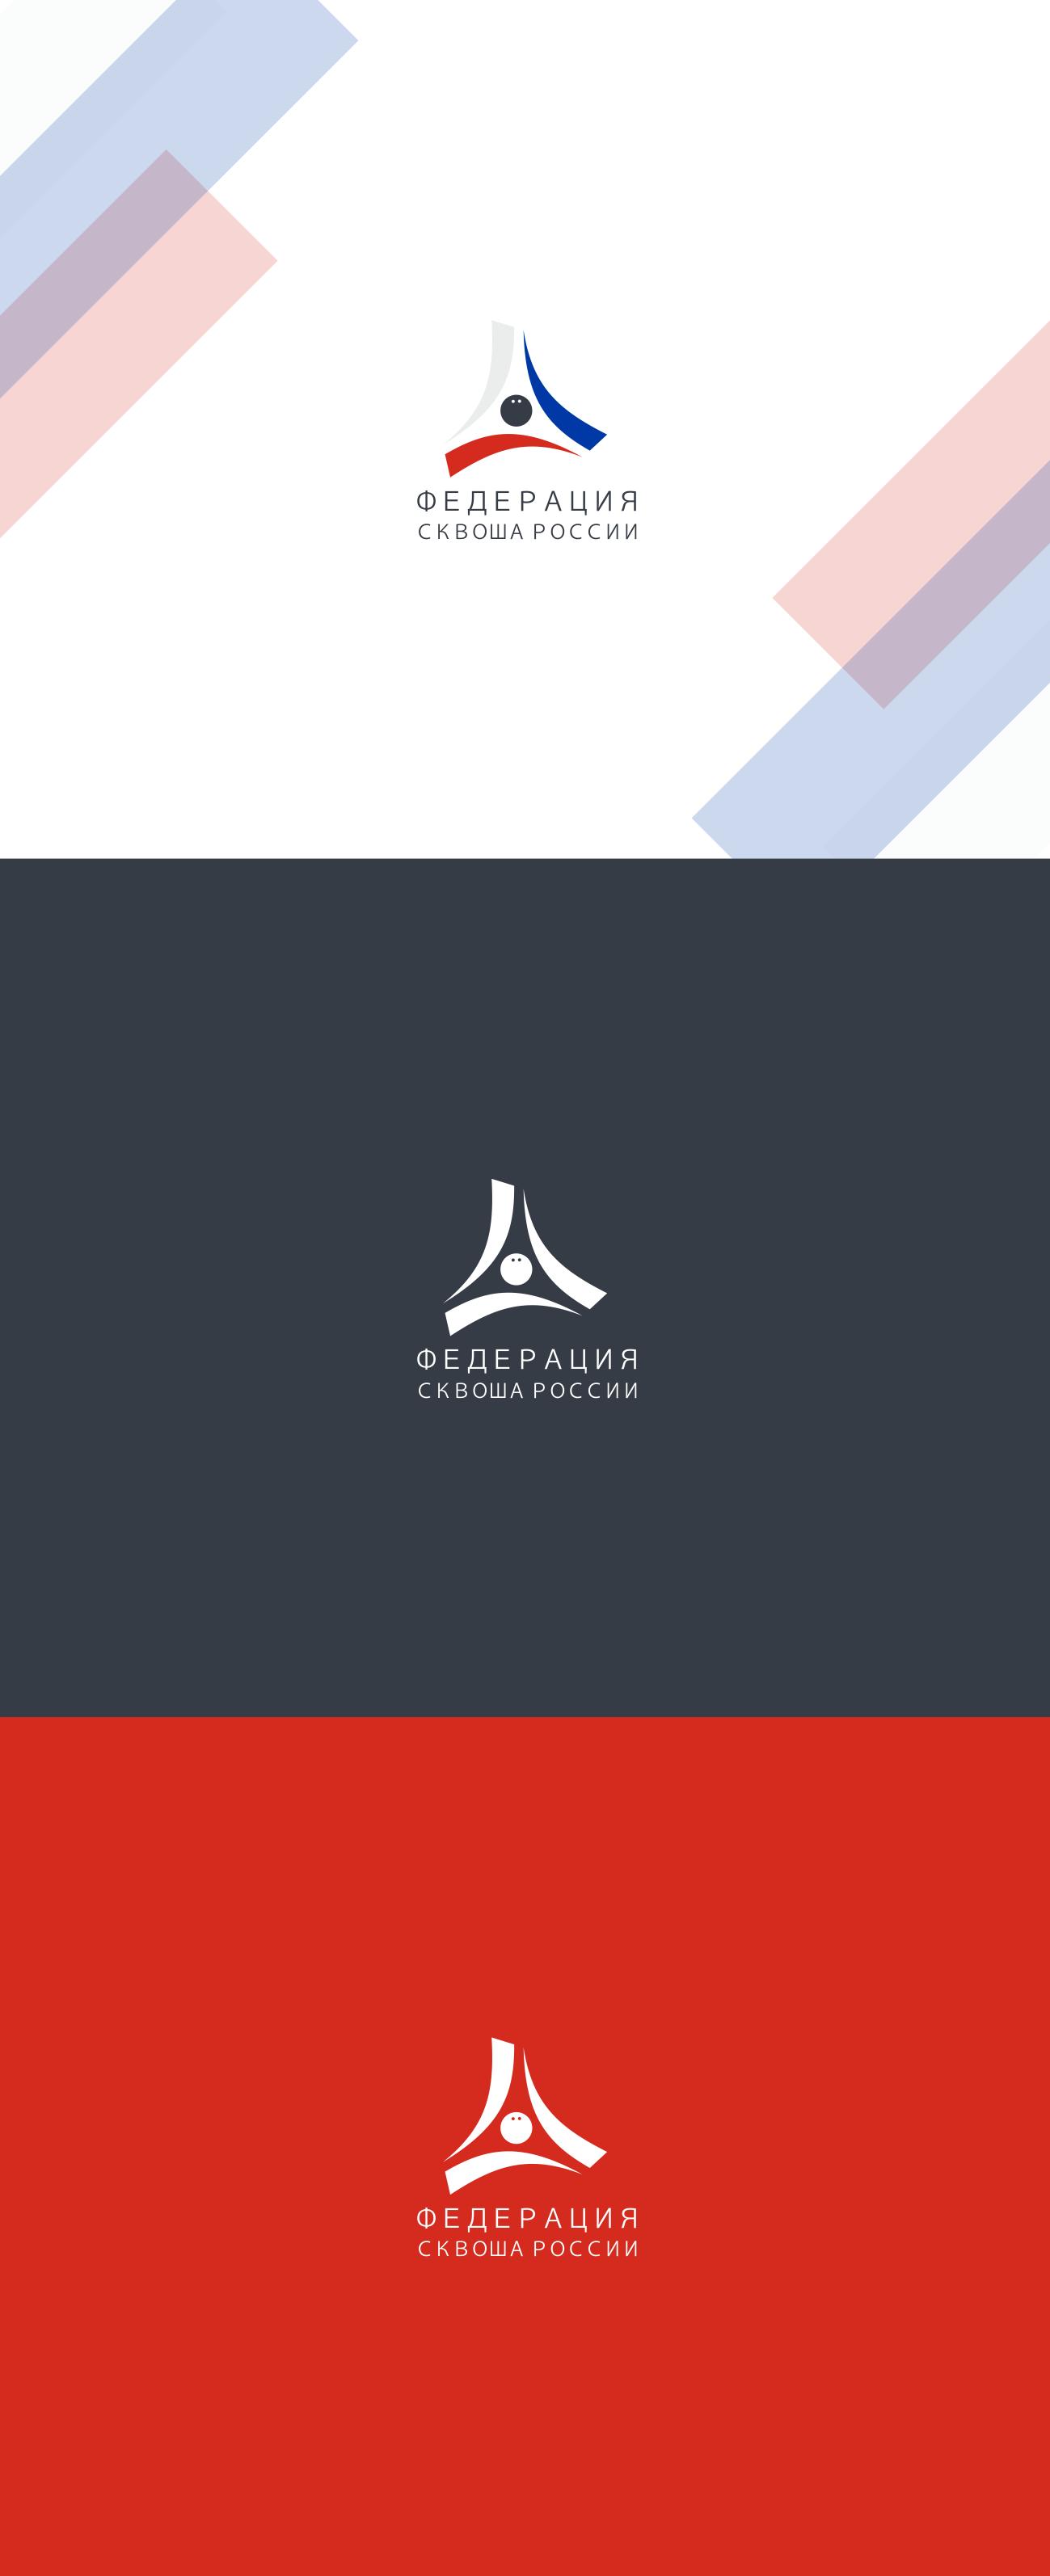 Разработать логотип для Федерации сквоша России фото f_0985f3278bee57e1.png